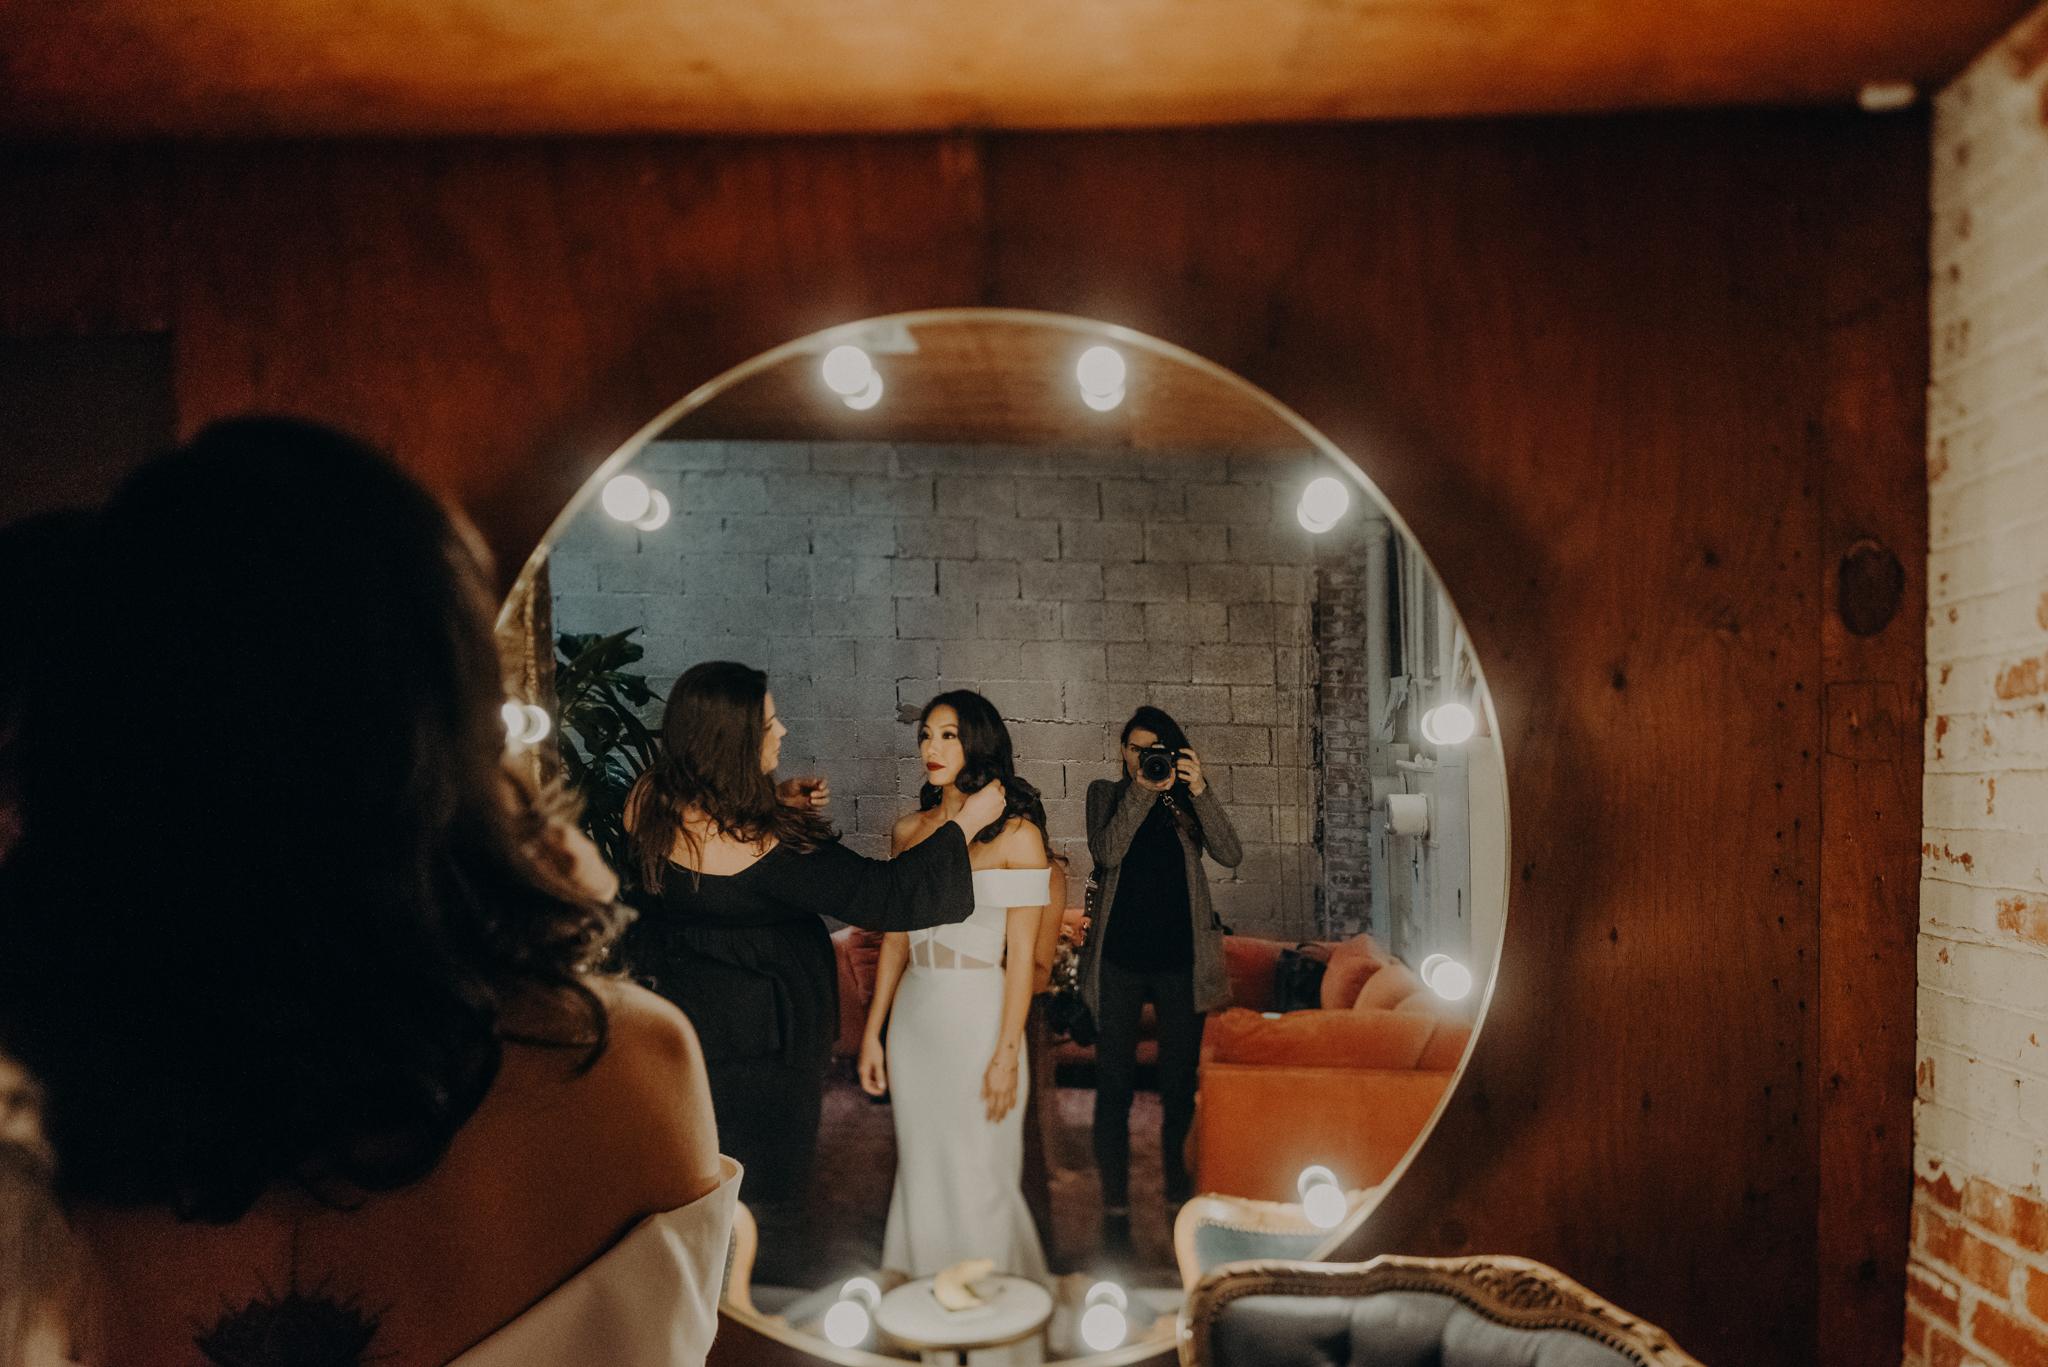 Wedding Photo LA - wedding photographer in los angeles - millwick wedding venue -isaiahandtaylor.com-008.jpg